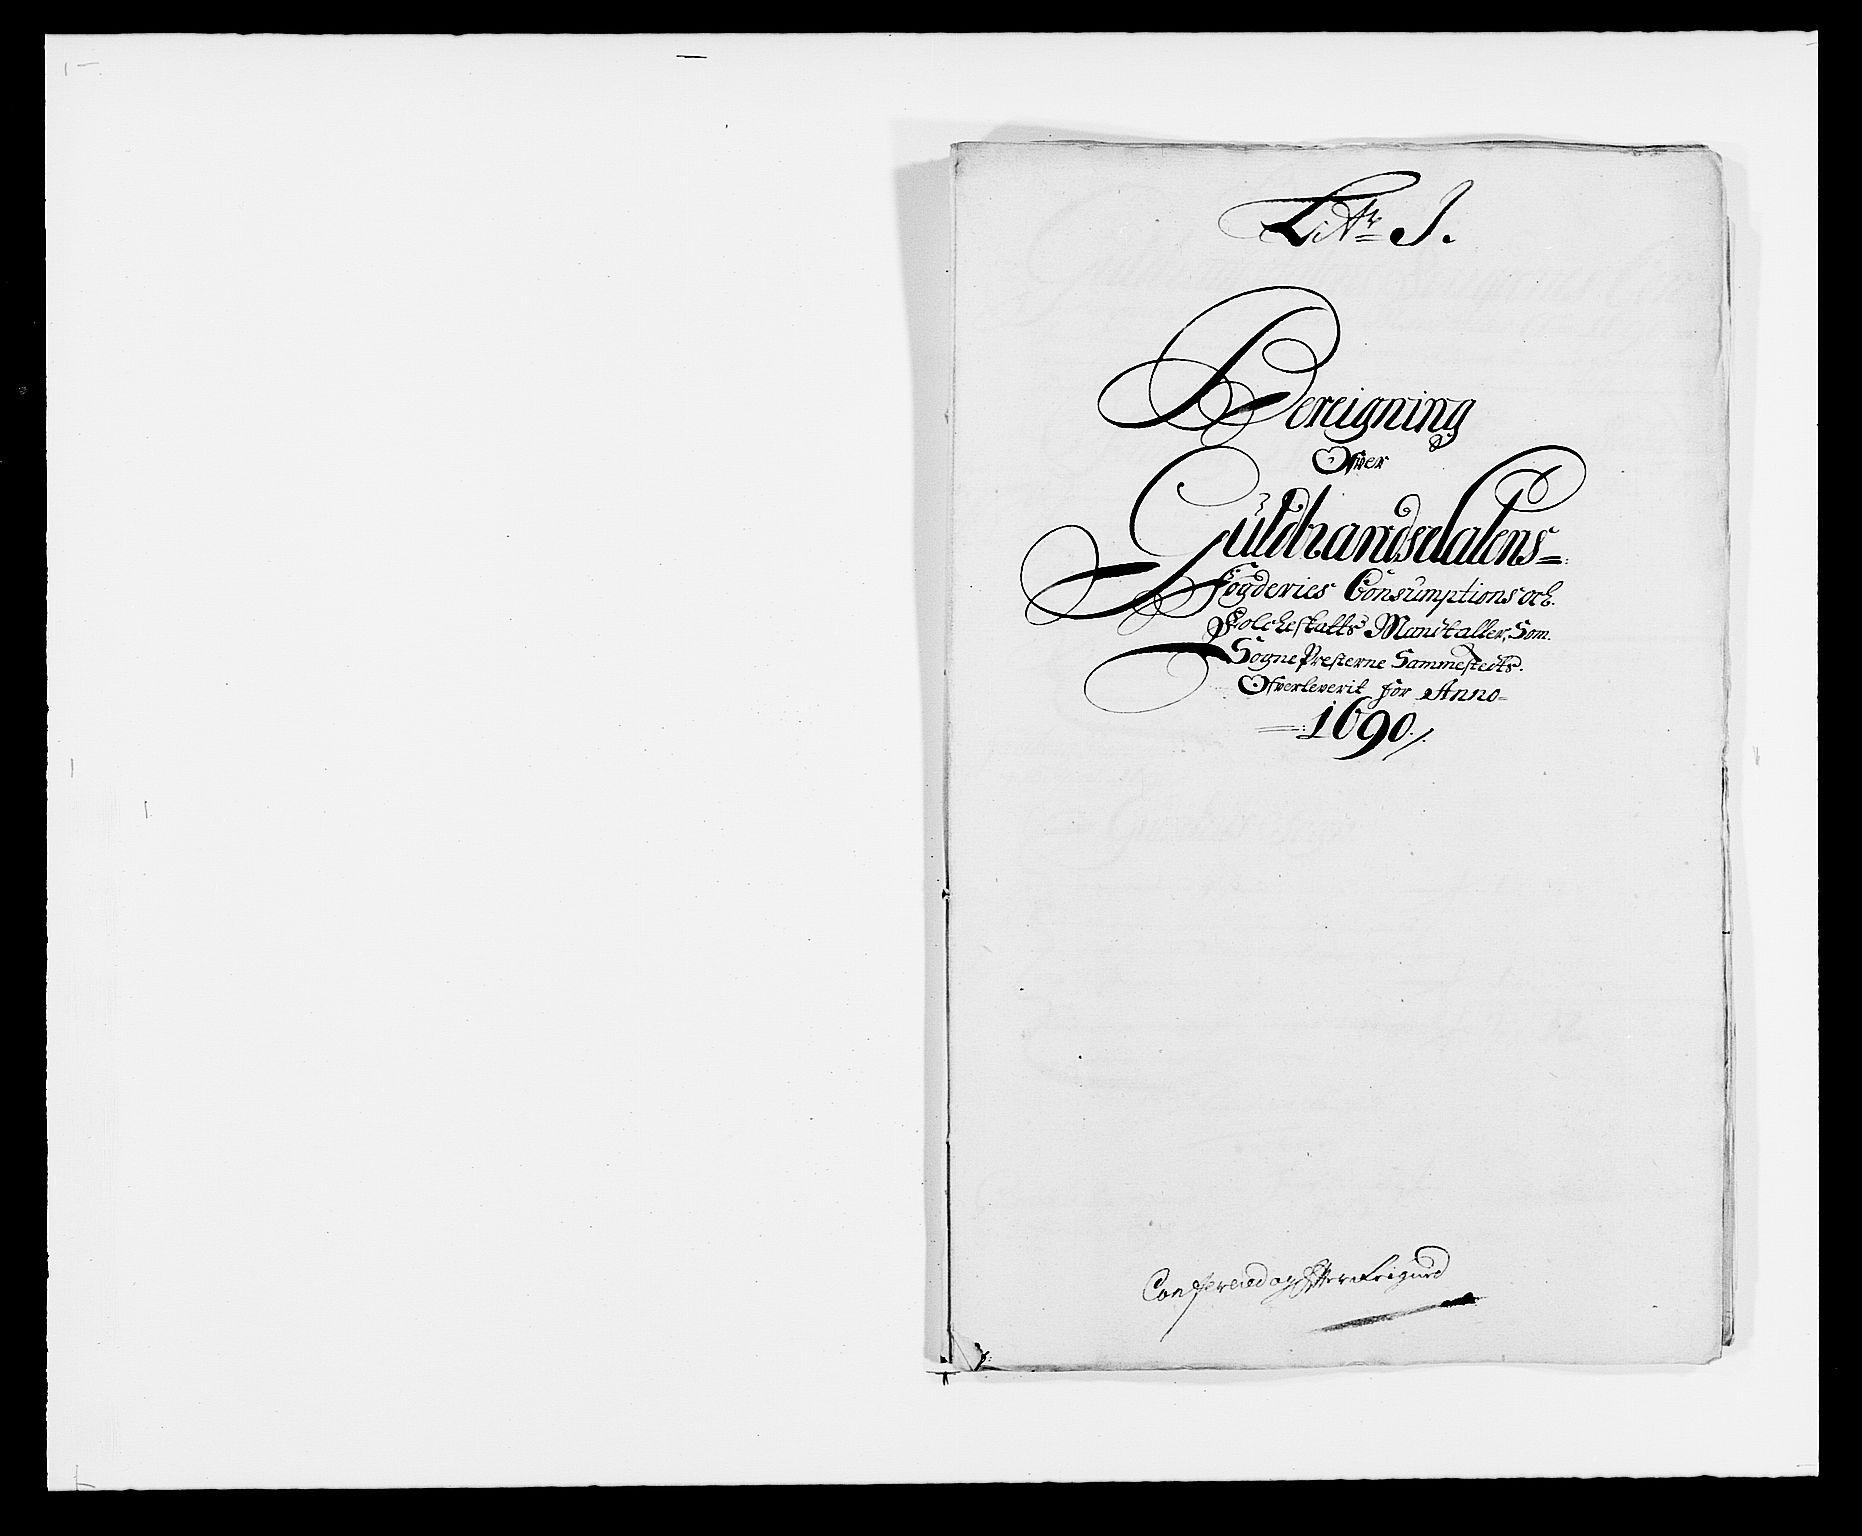 RA, Rentekammeret inntil 1814, Reviderte regnskaper, Fogderegnskap, R17/L1165: Fogderegnskap Gudbrandsdal, 1690-1692, s. 146